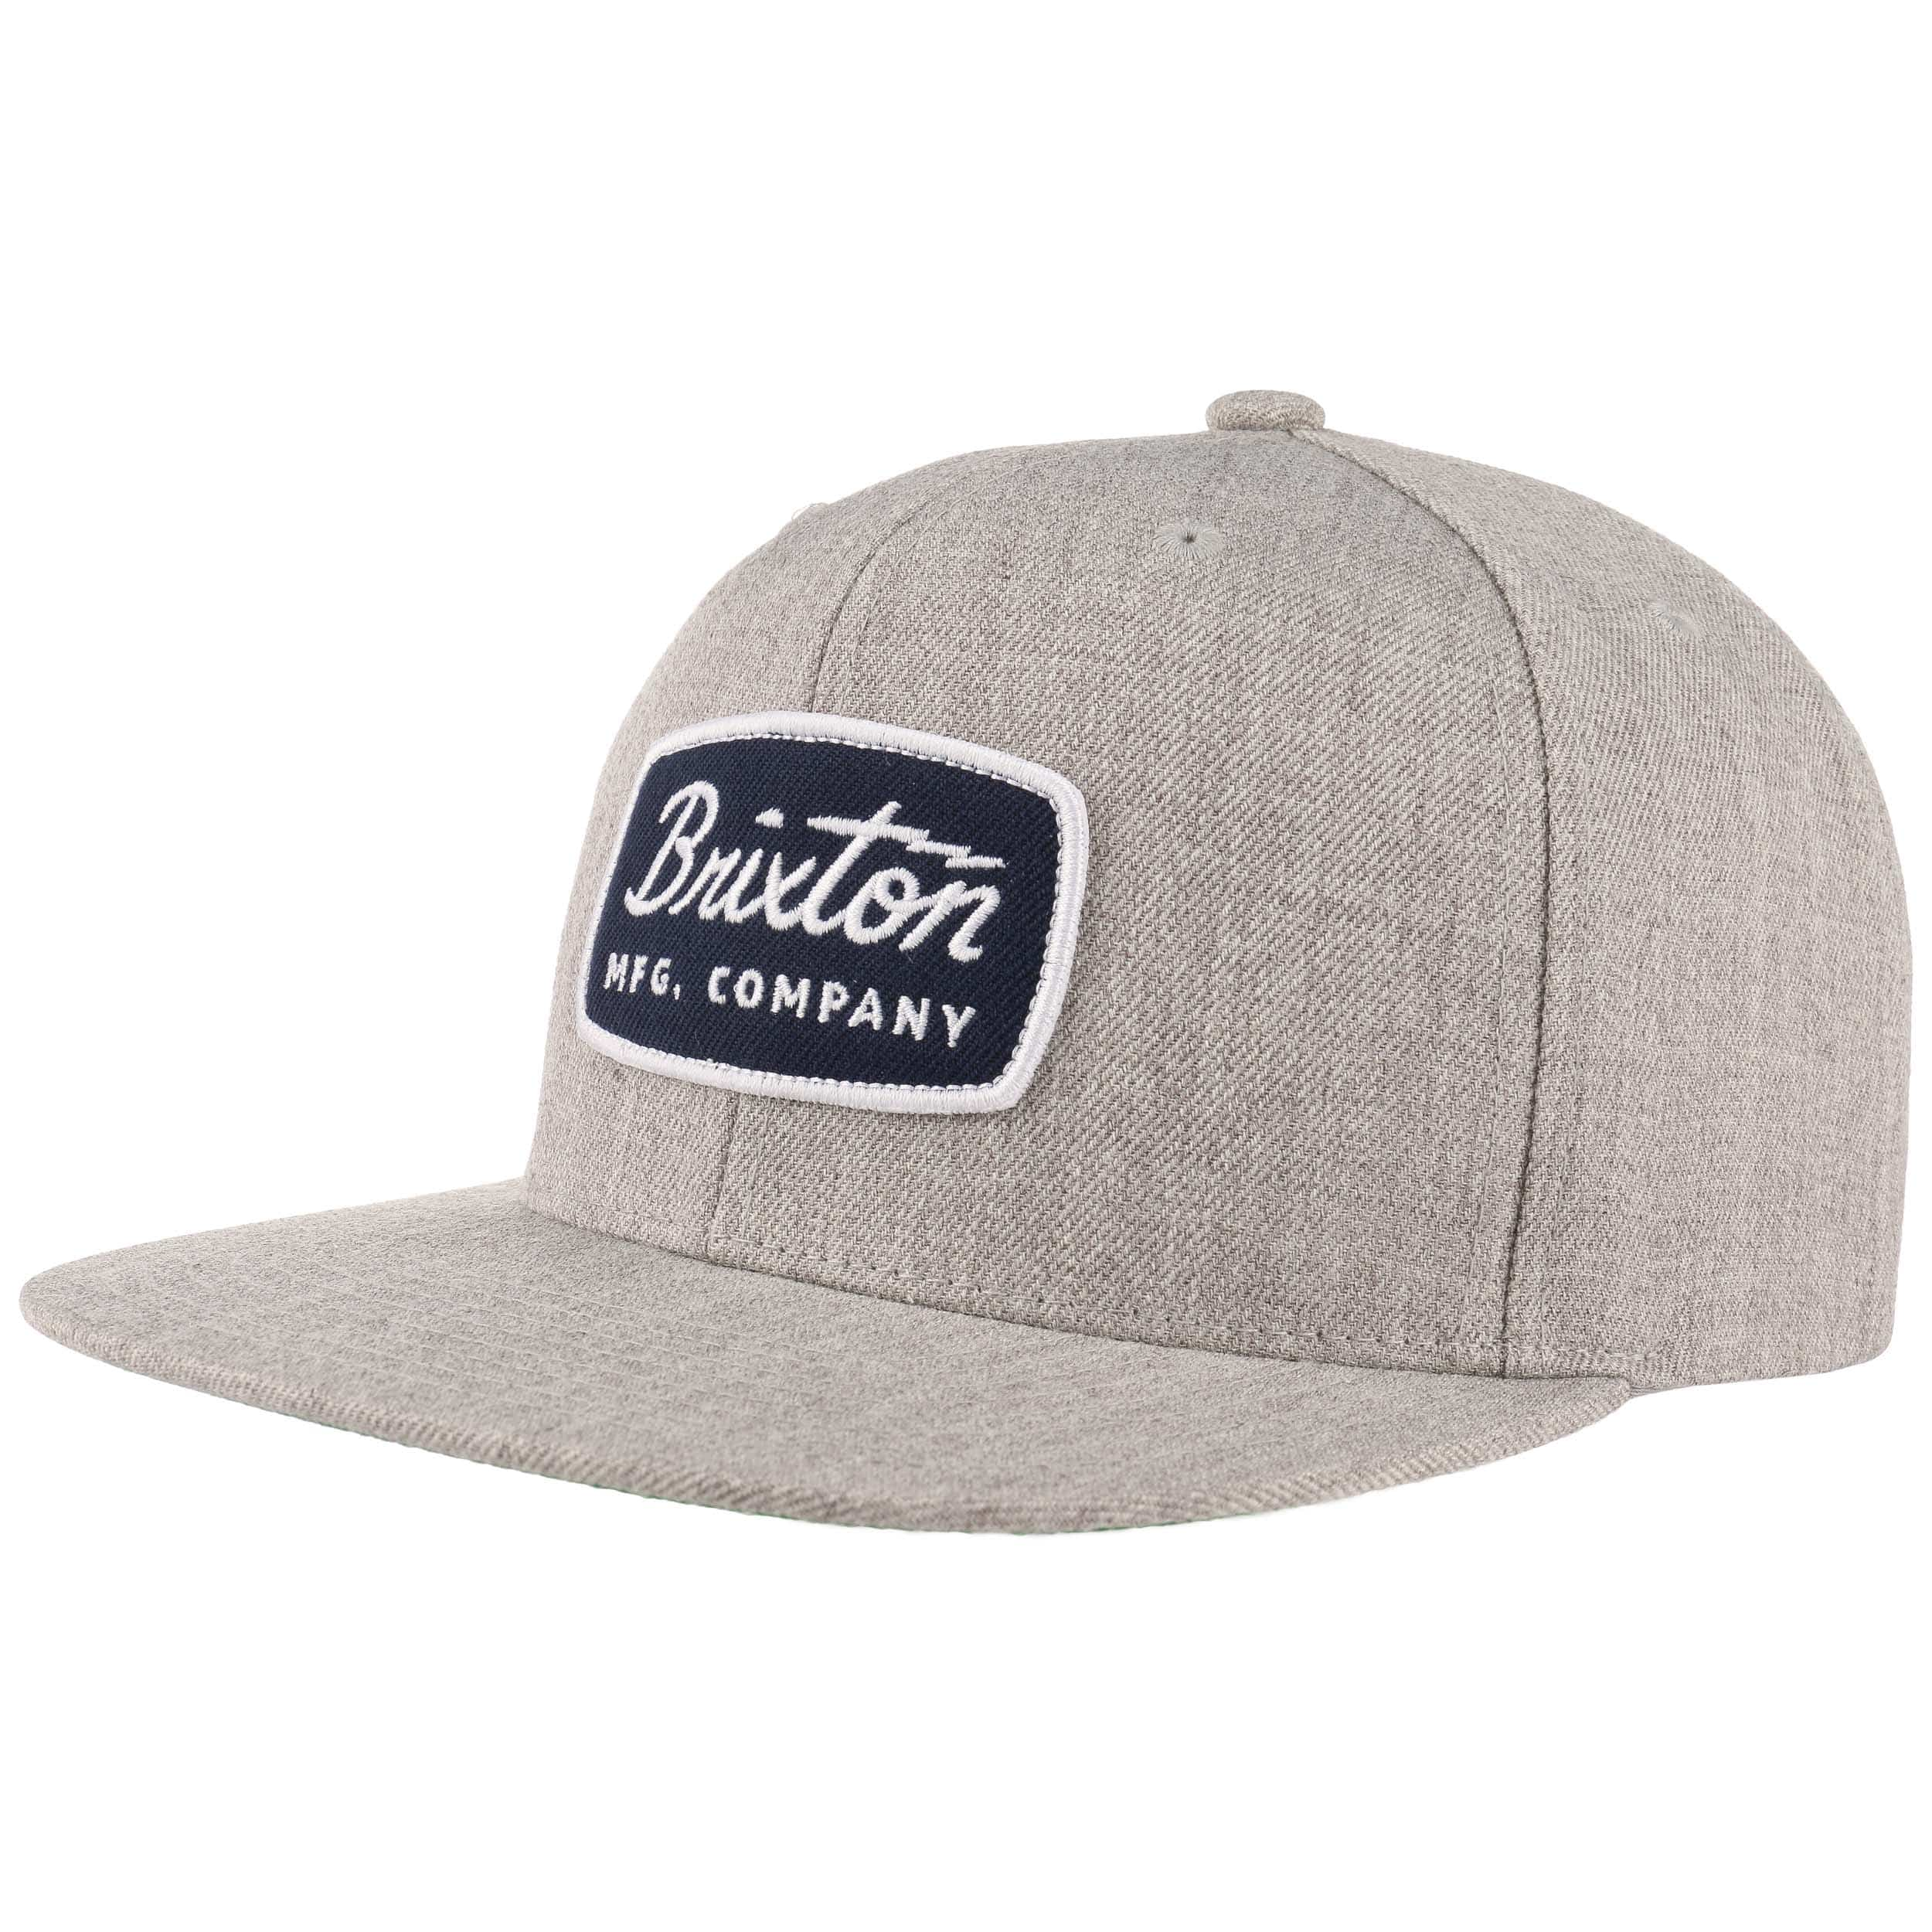 Gorra Jolt Snapback by Brixton - Gorras - sombreroshop.es 2c6f488ef83